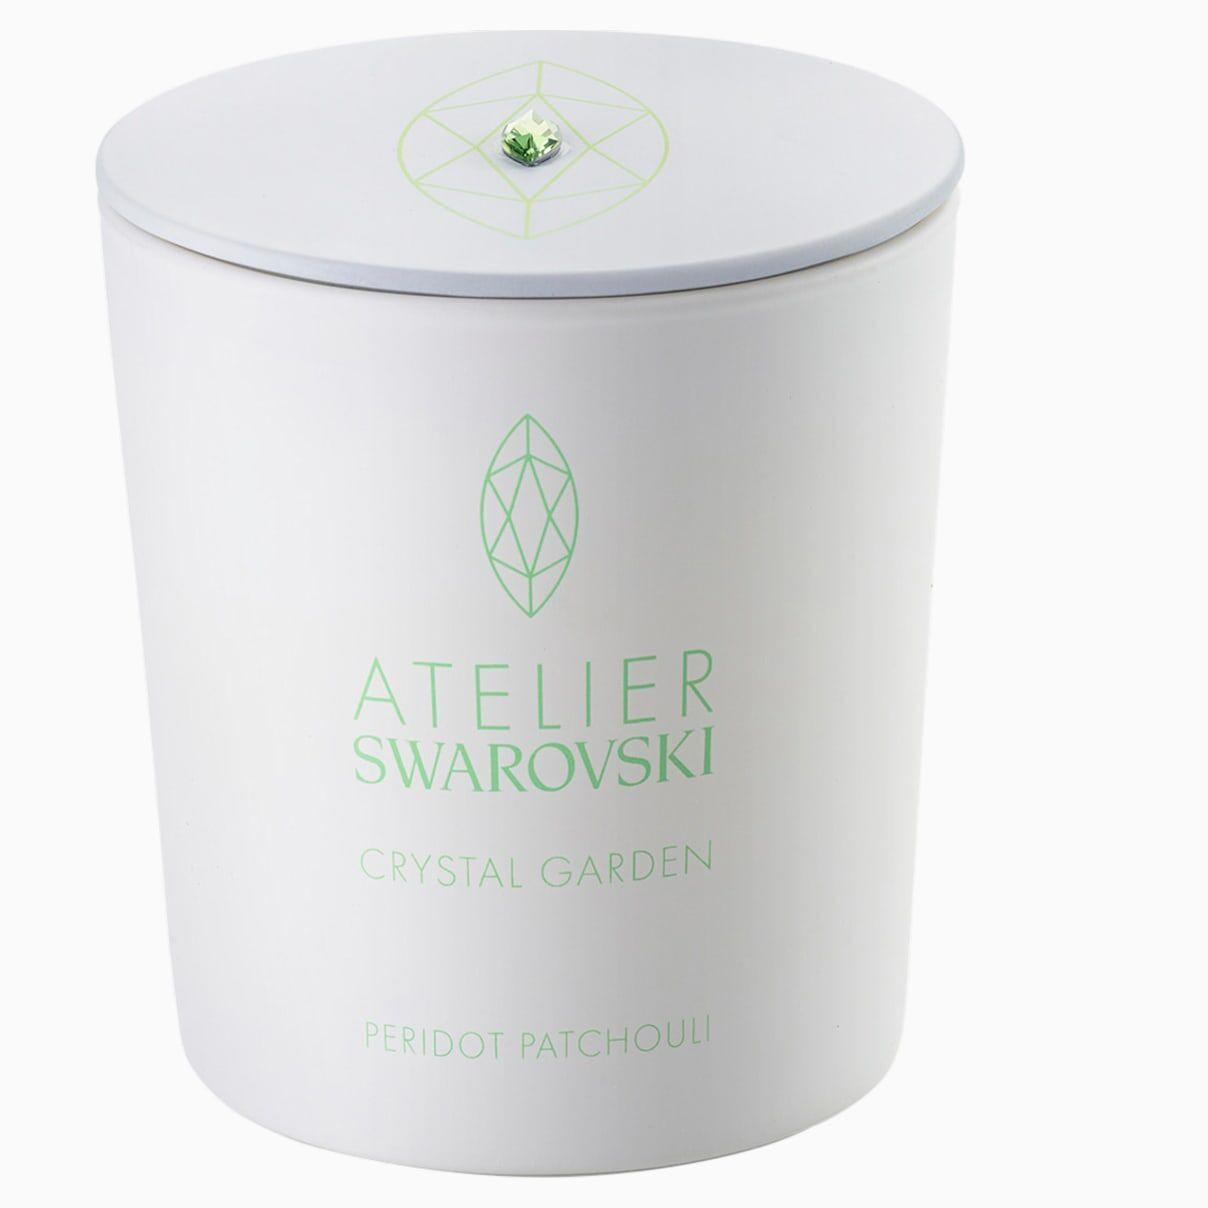 Swarovski Crystal Garden Candle, Green, Peridot Patchouli